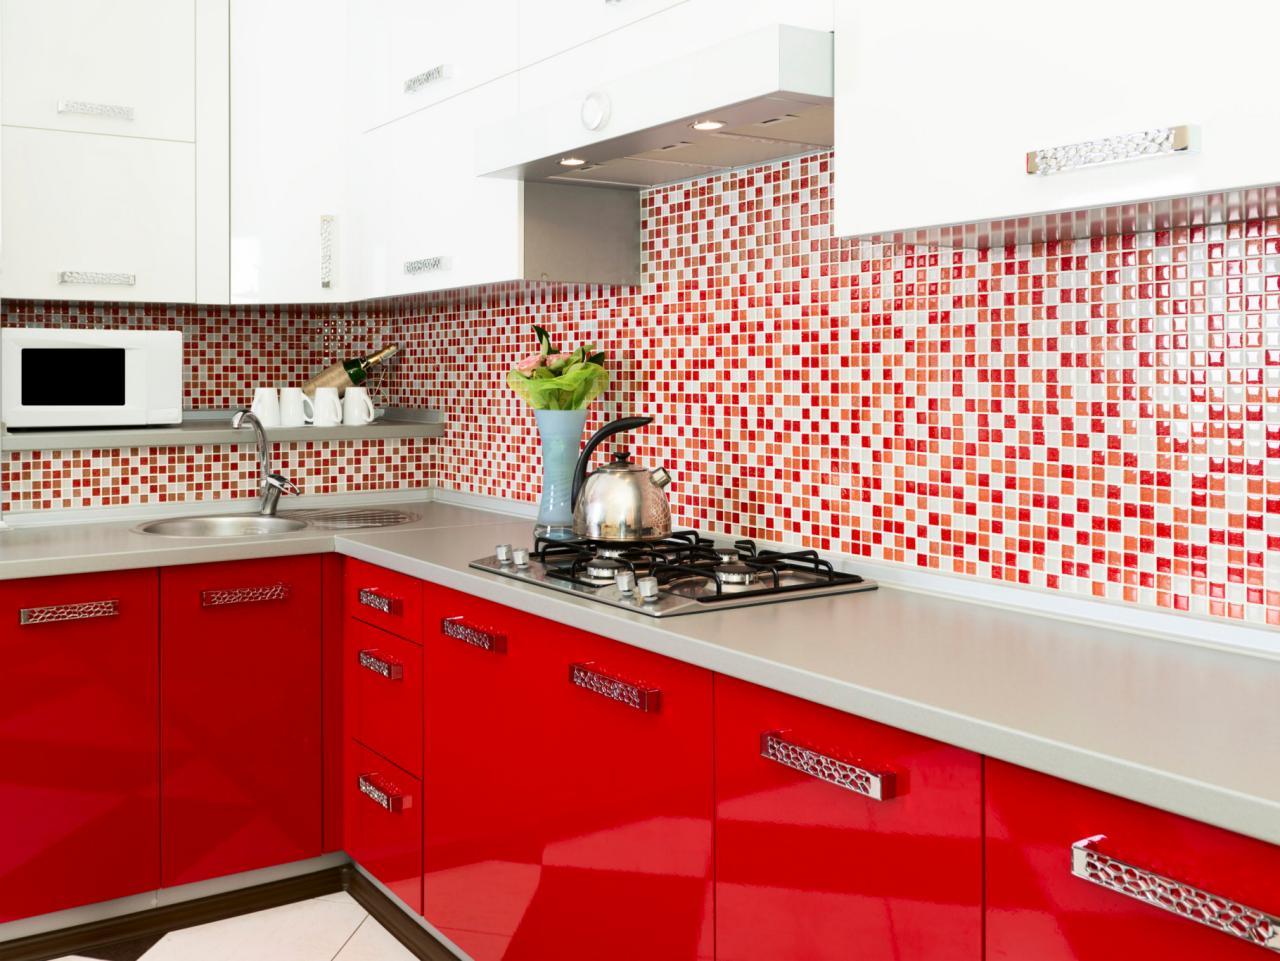 ts-159025550_moderne-rouge-cuisine_s4x3-jpg-rend-hgtvcom-1280-960